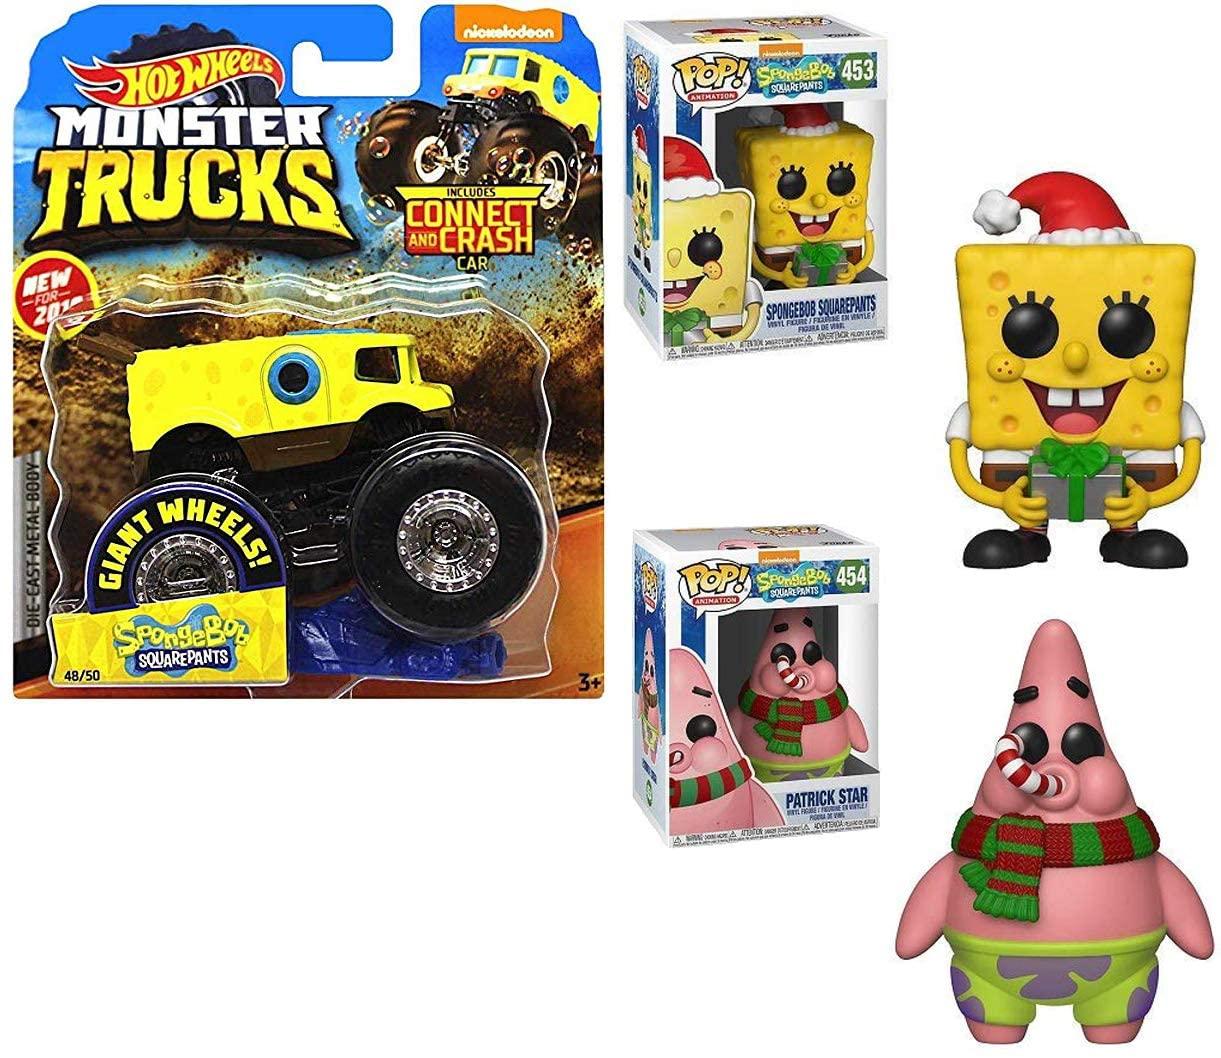 Sea Sponge Bob The Spongebob Monster Truck Action Jam Squarepants Wheels Official Pickup Bundled with Holiday Pop! Figure & Patrick Star Vinyl Character 3 Items Bundle